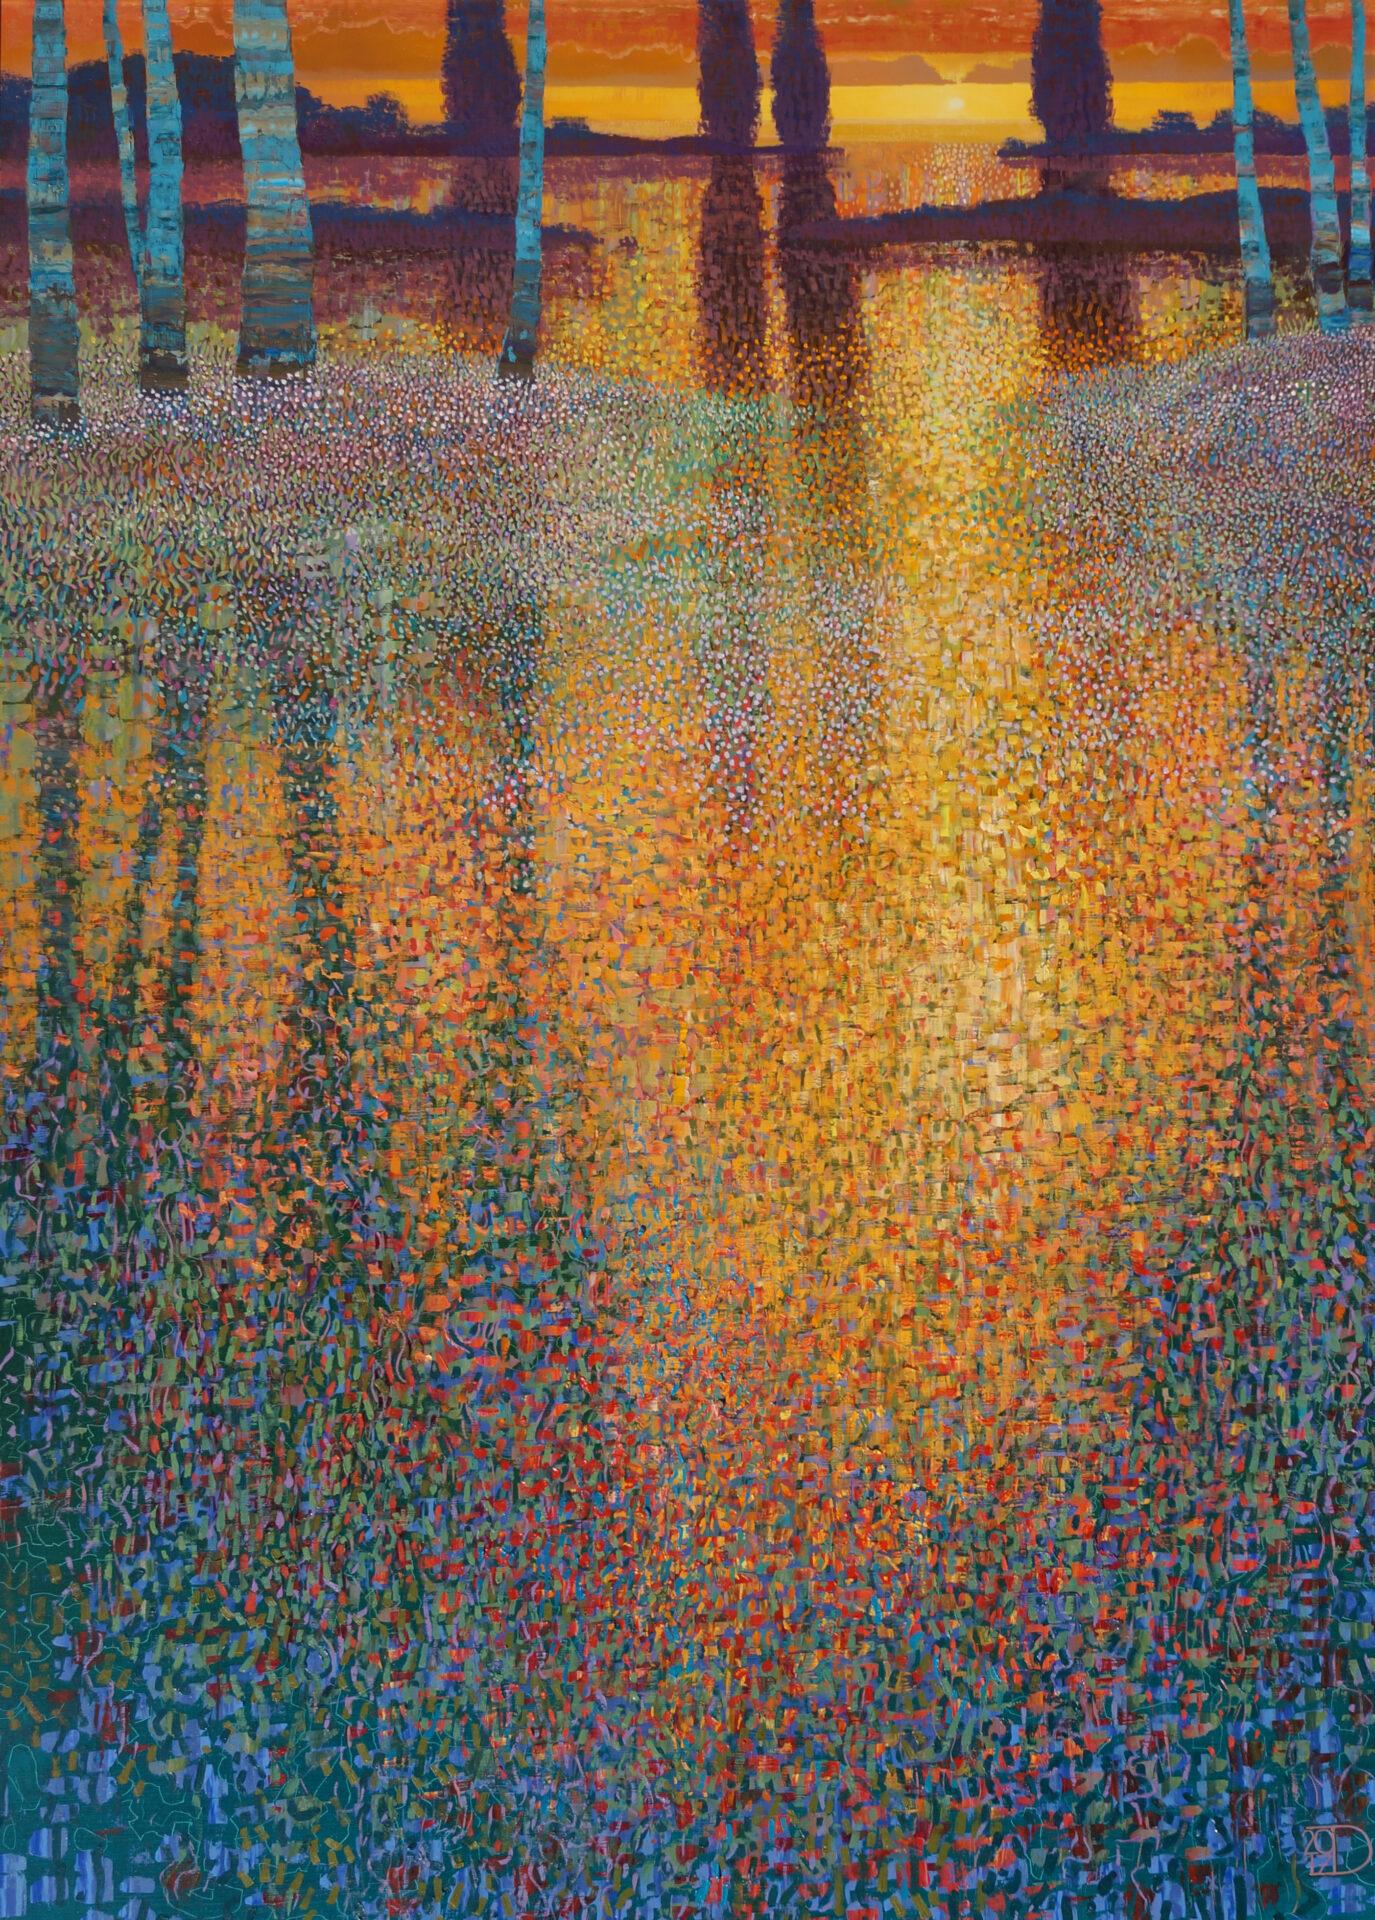 Ton Dubbeldam - The Golden Hour